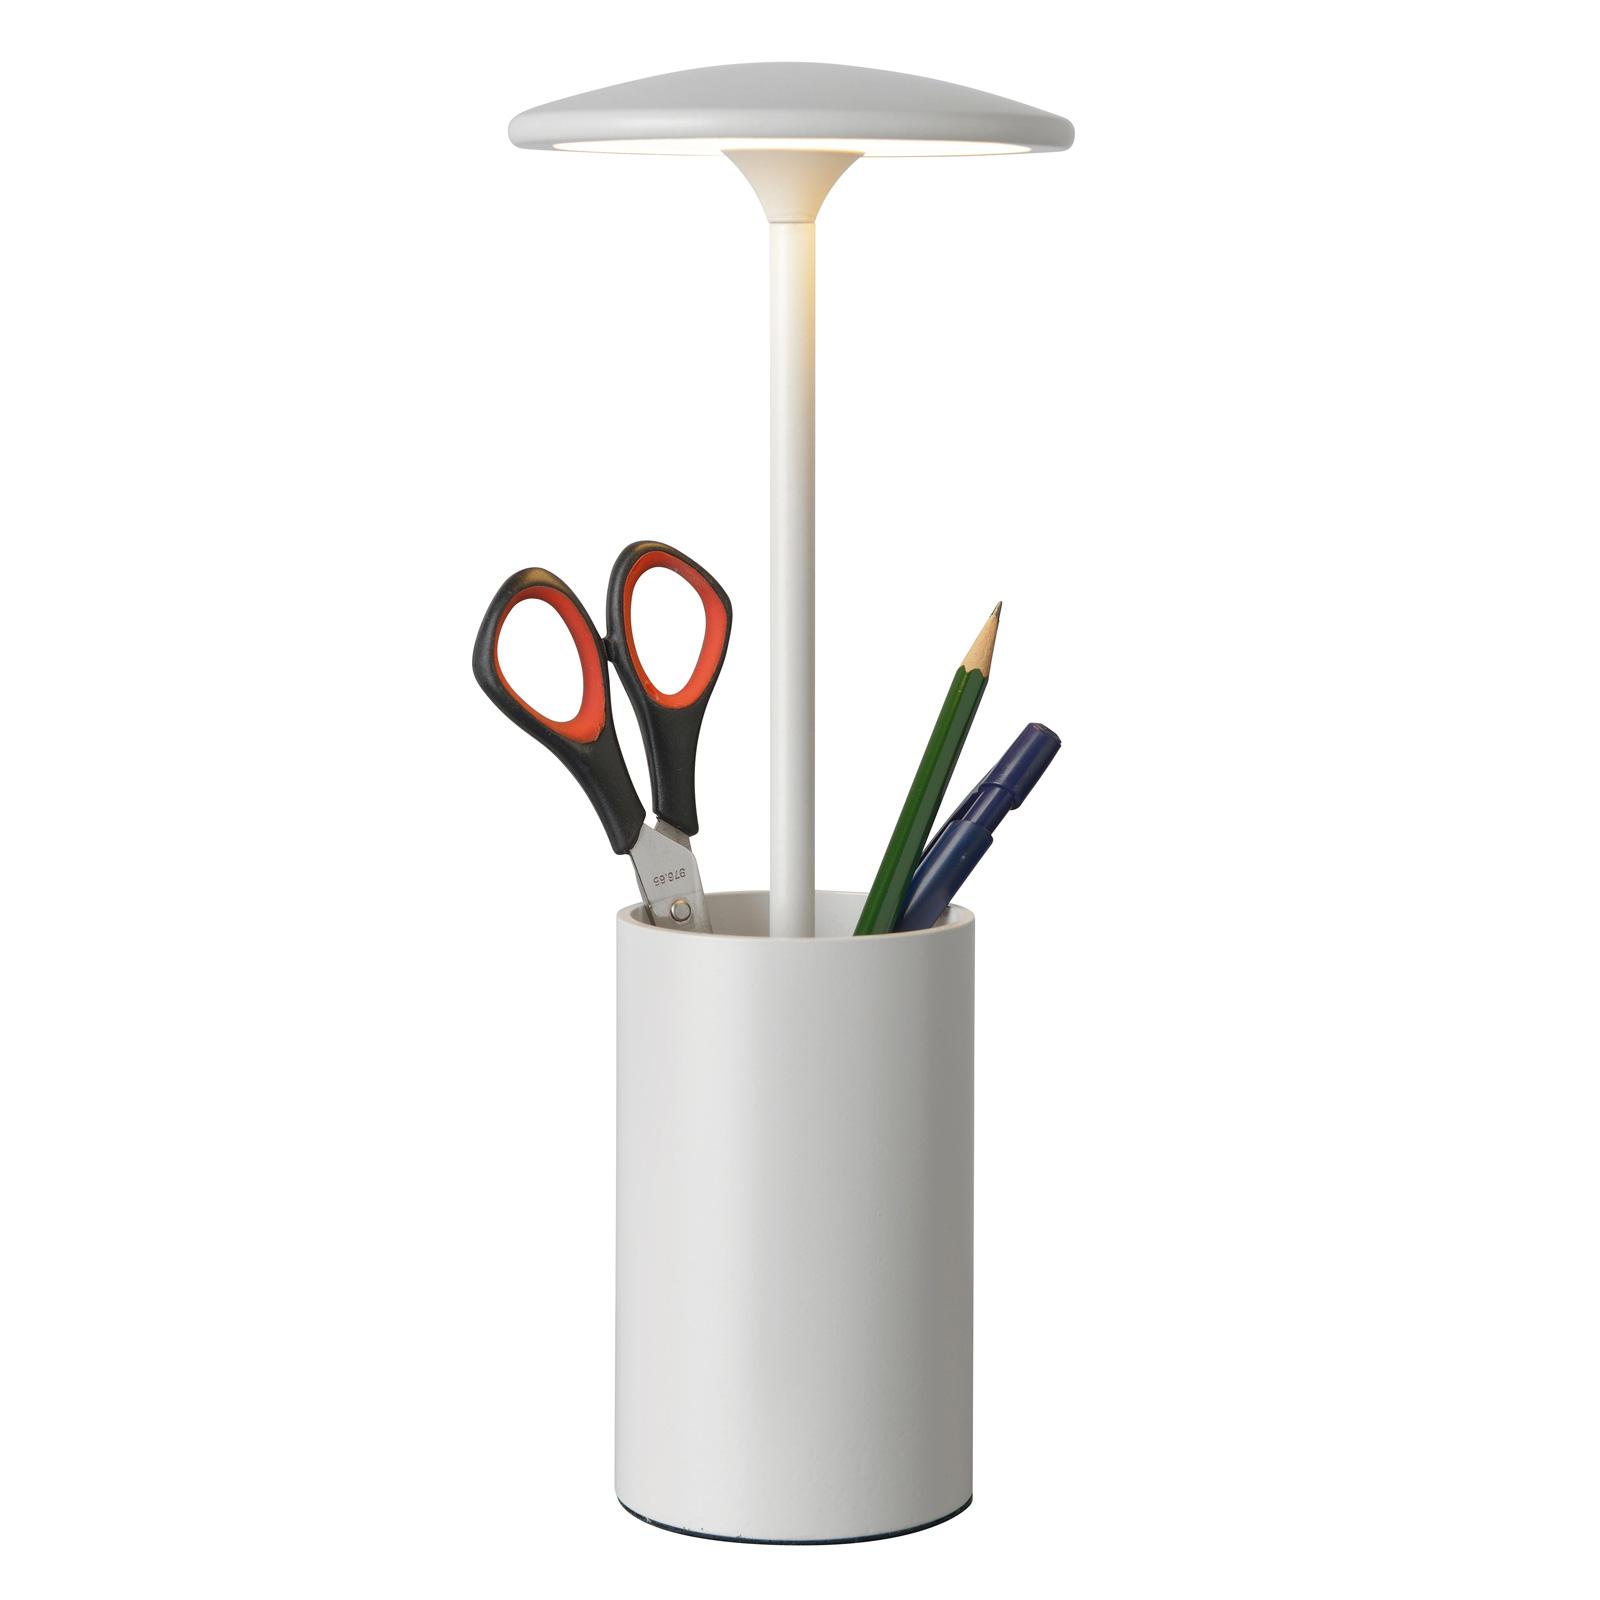 LED tafellamp Pott met opbergvat, wit